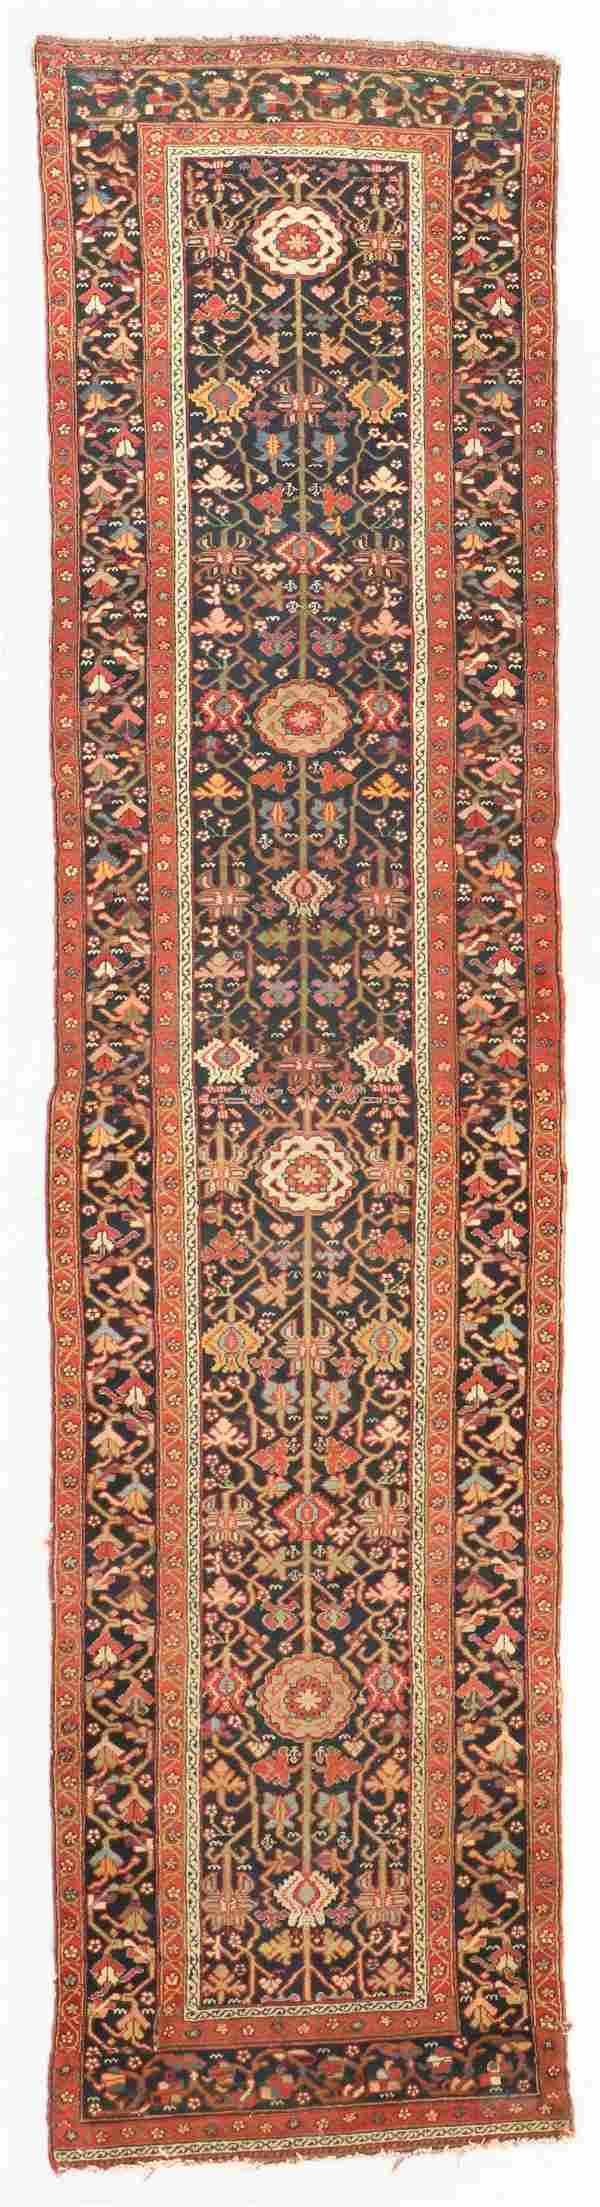 Antique West Persian Kurd Rug, Persia: 3'0'' x 12'3''